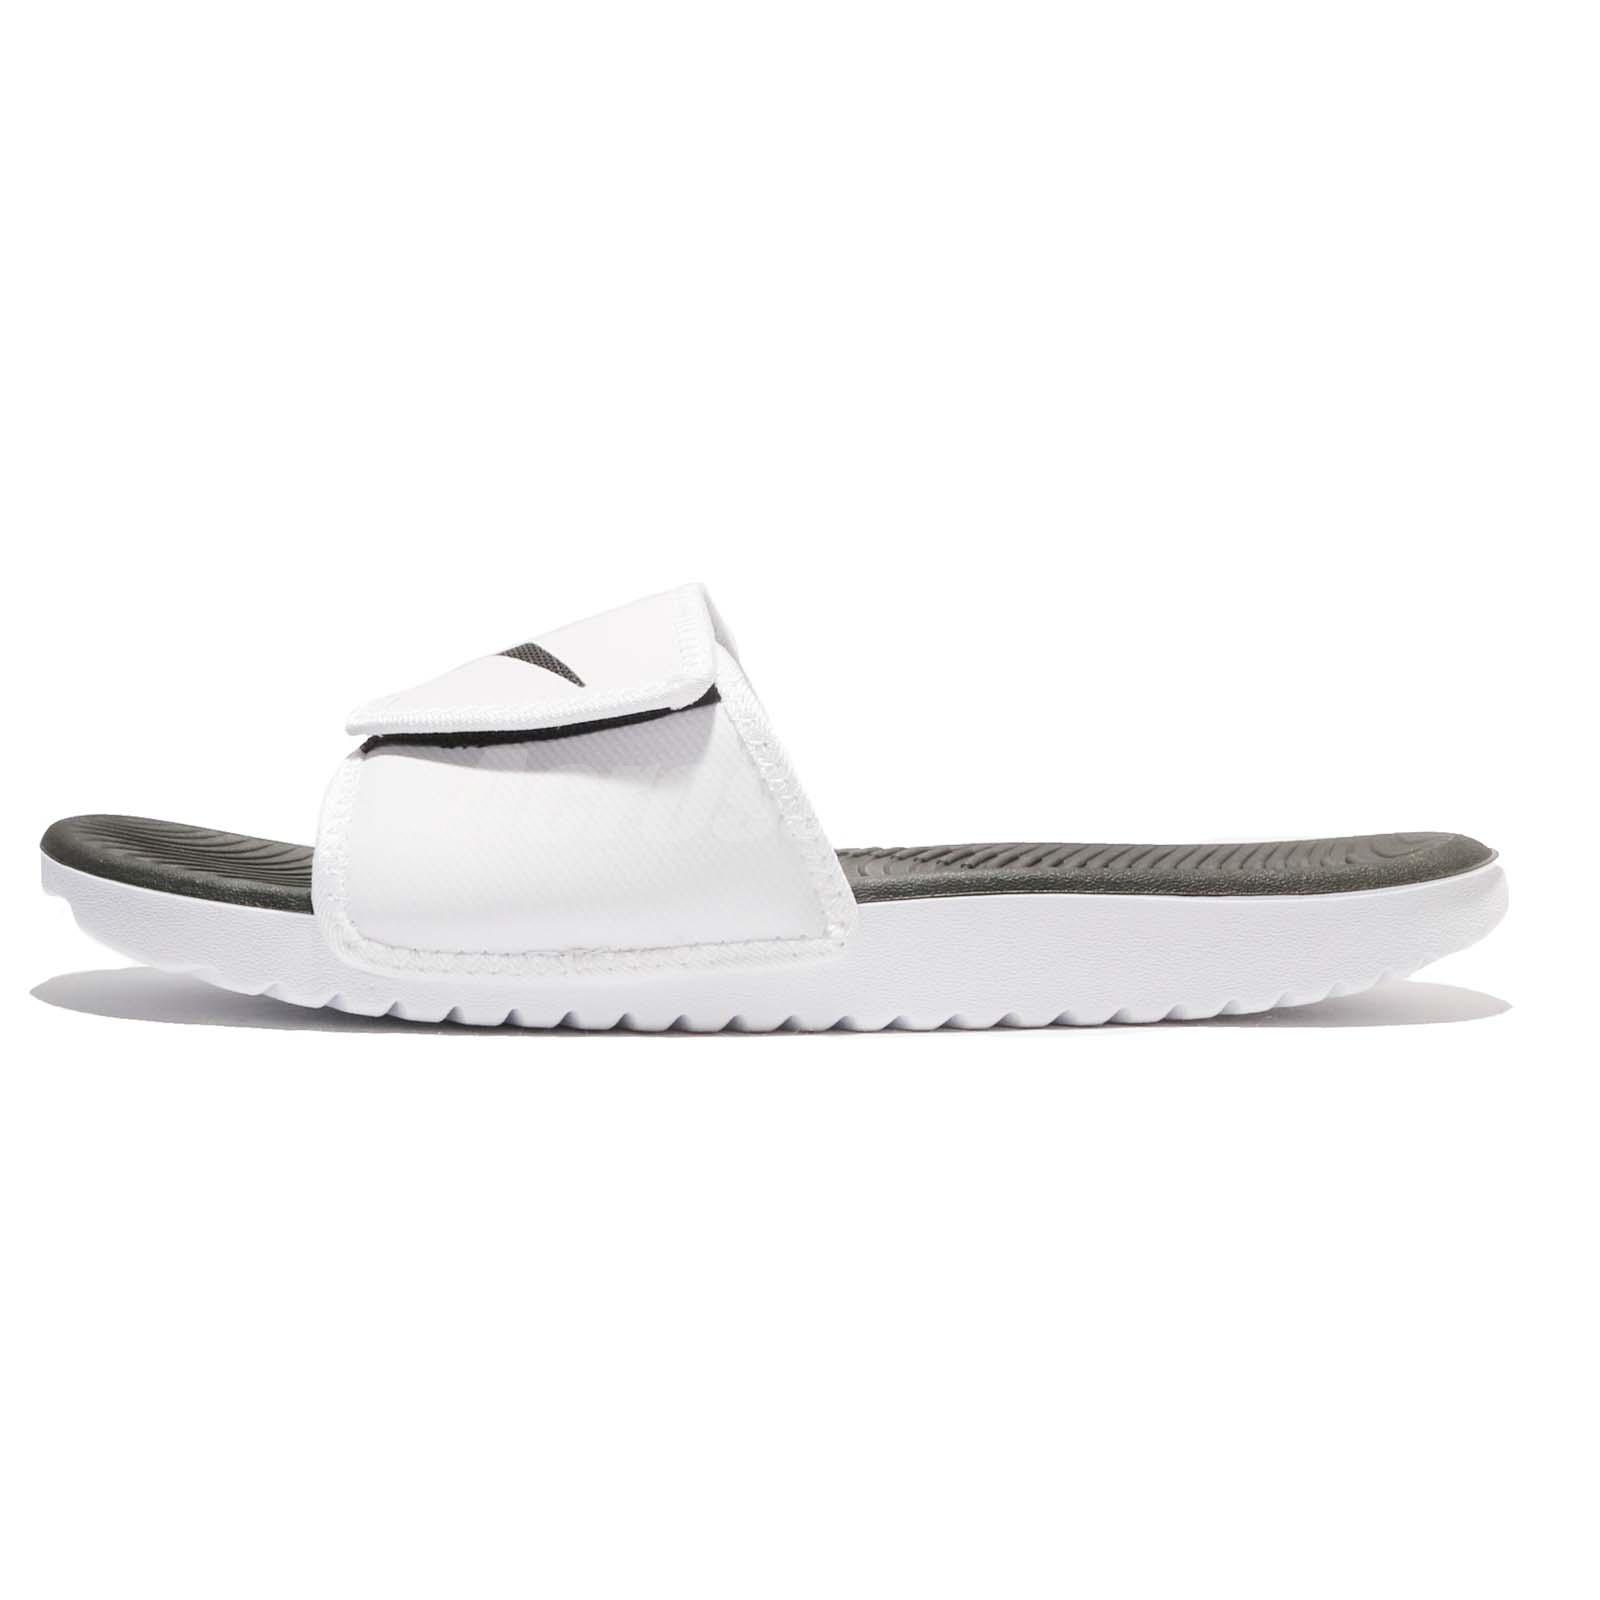 Sandali Nike Per Gli Uomini 101 Kw0aEPNOOB